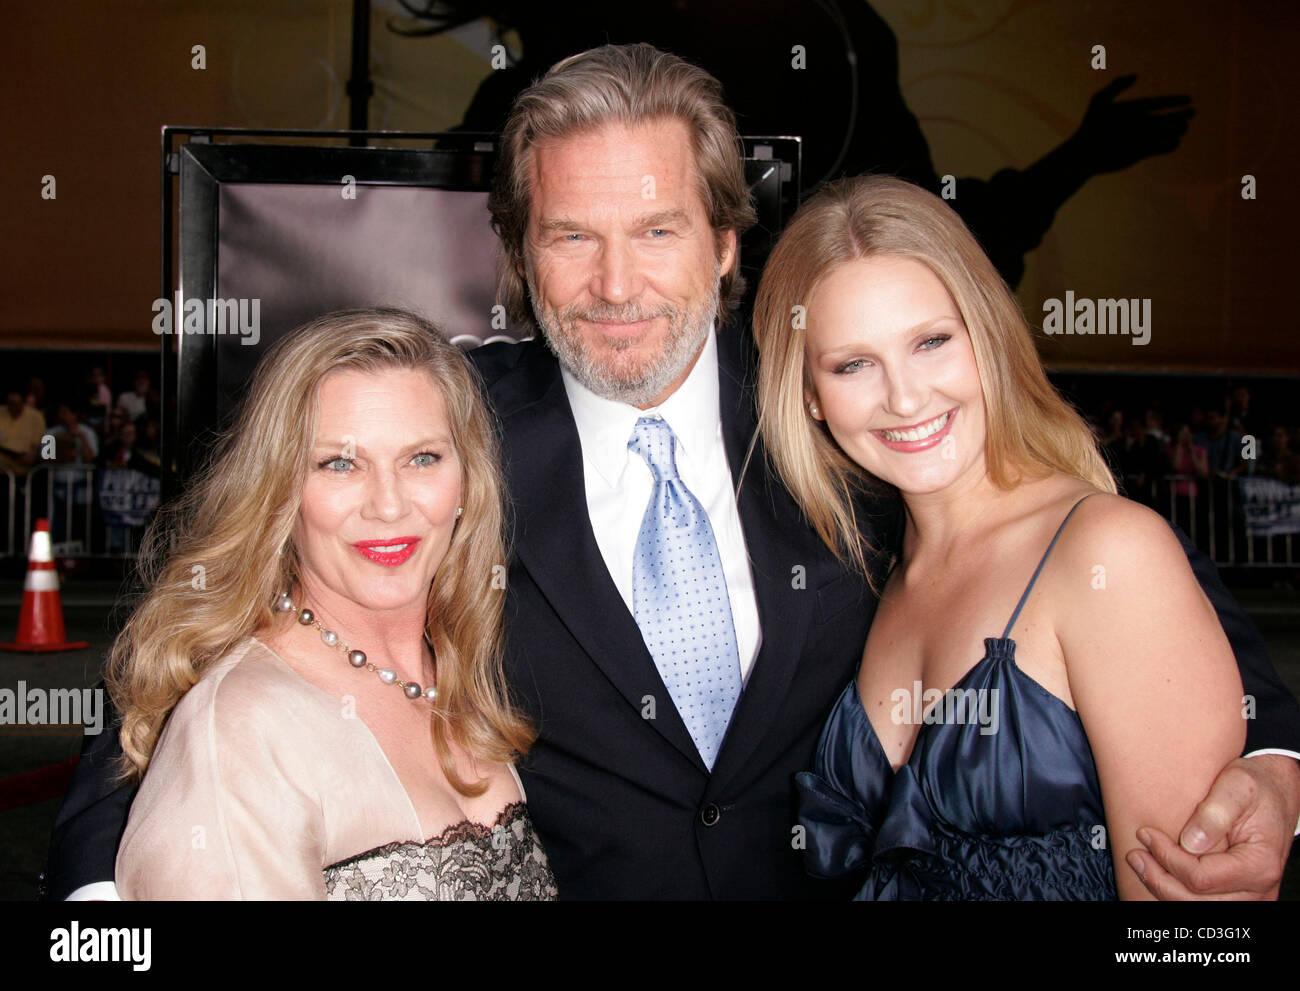 Apr 30, 2008 - Hollywood, California, USA - Actor JEFF ...